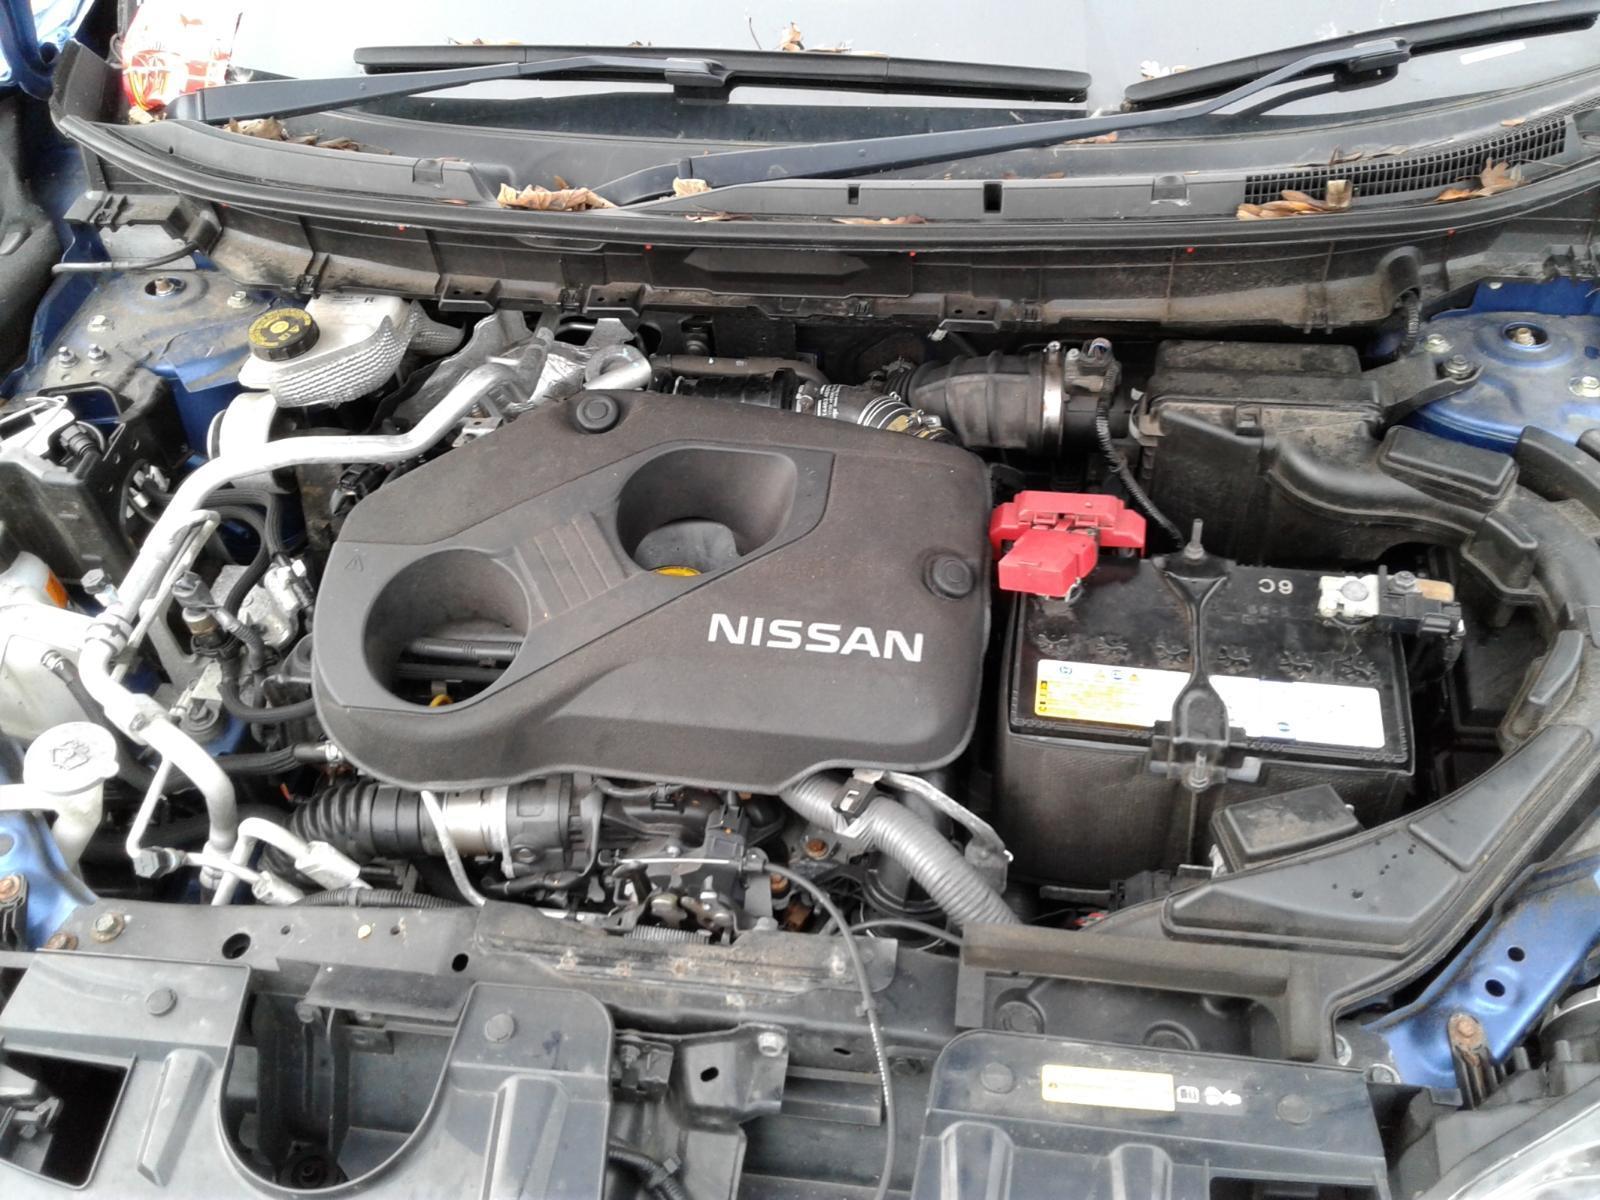 2018 NISSAN X-TRAIL Image